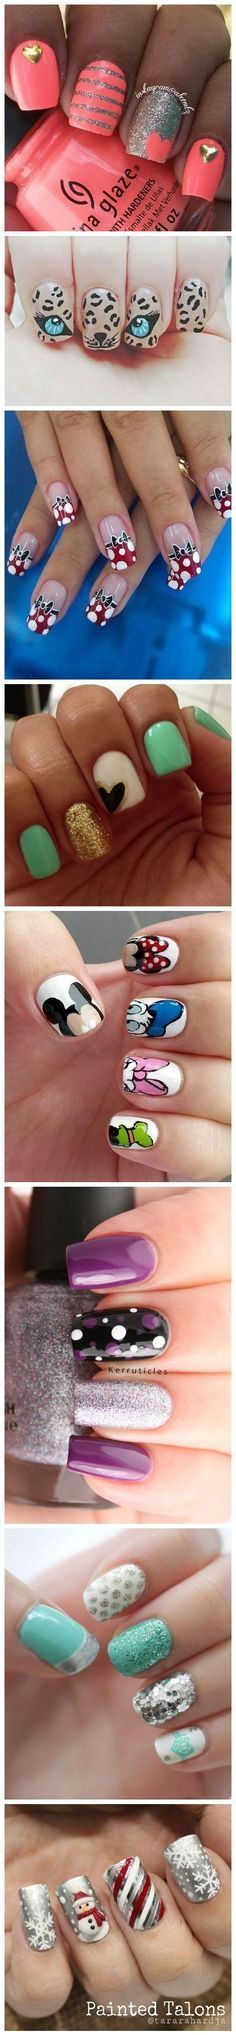 Best Nail Design Ideas